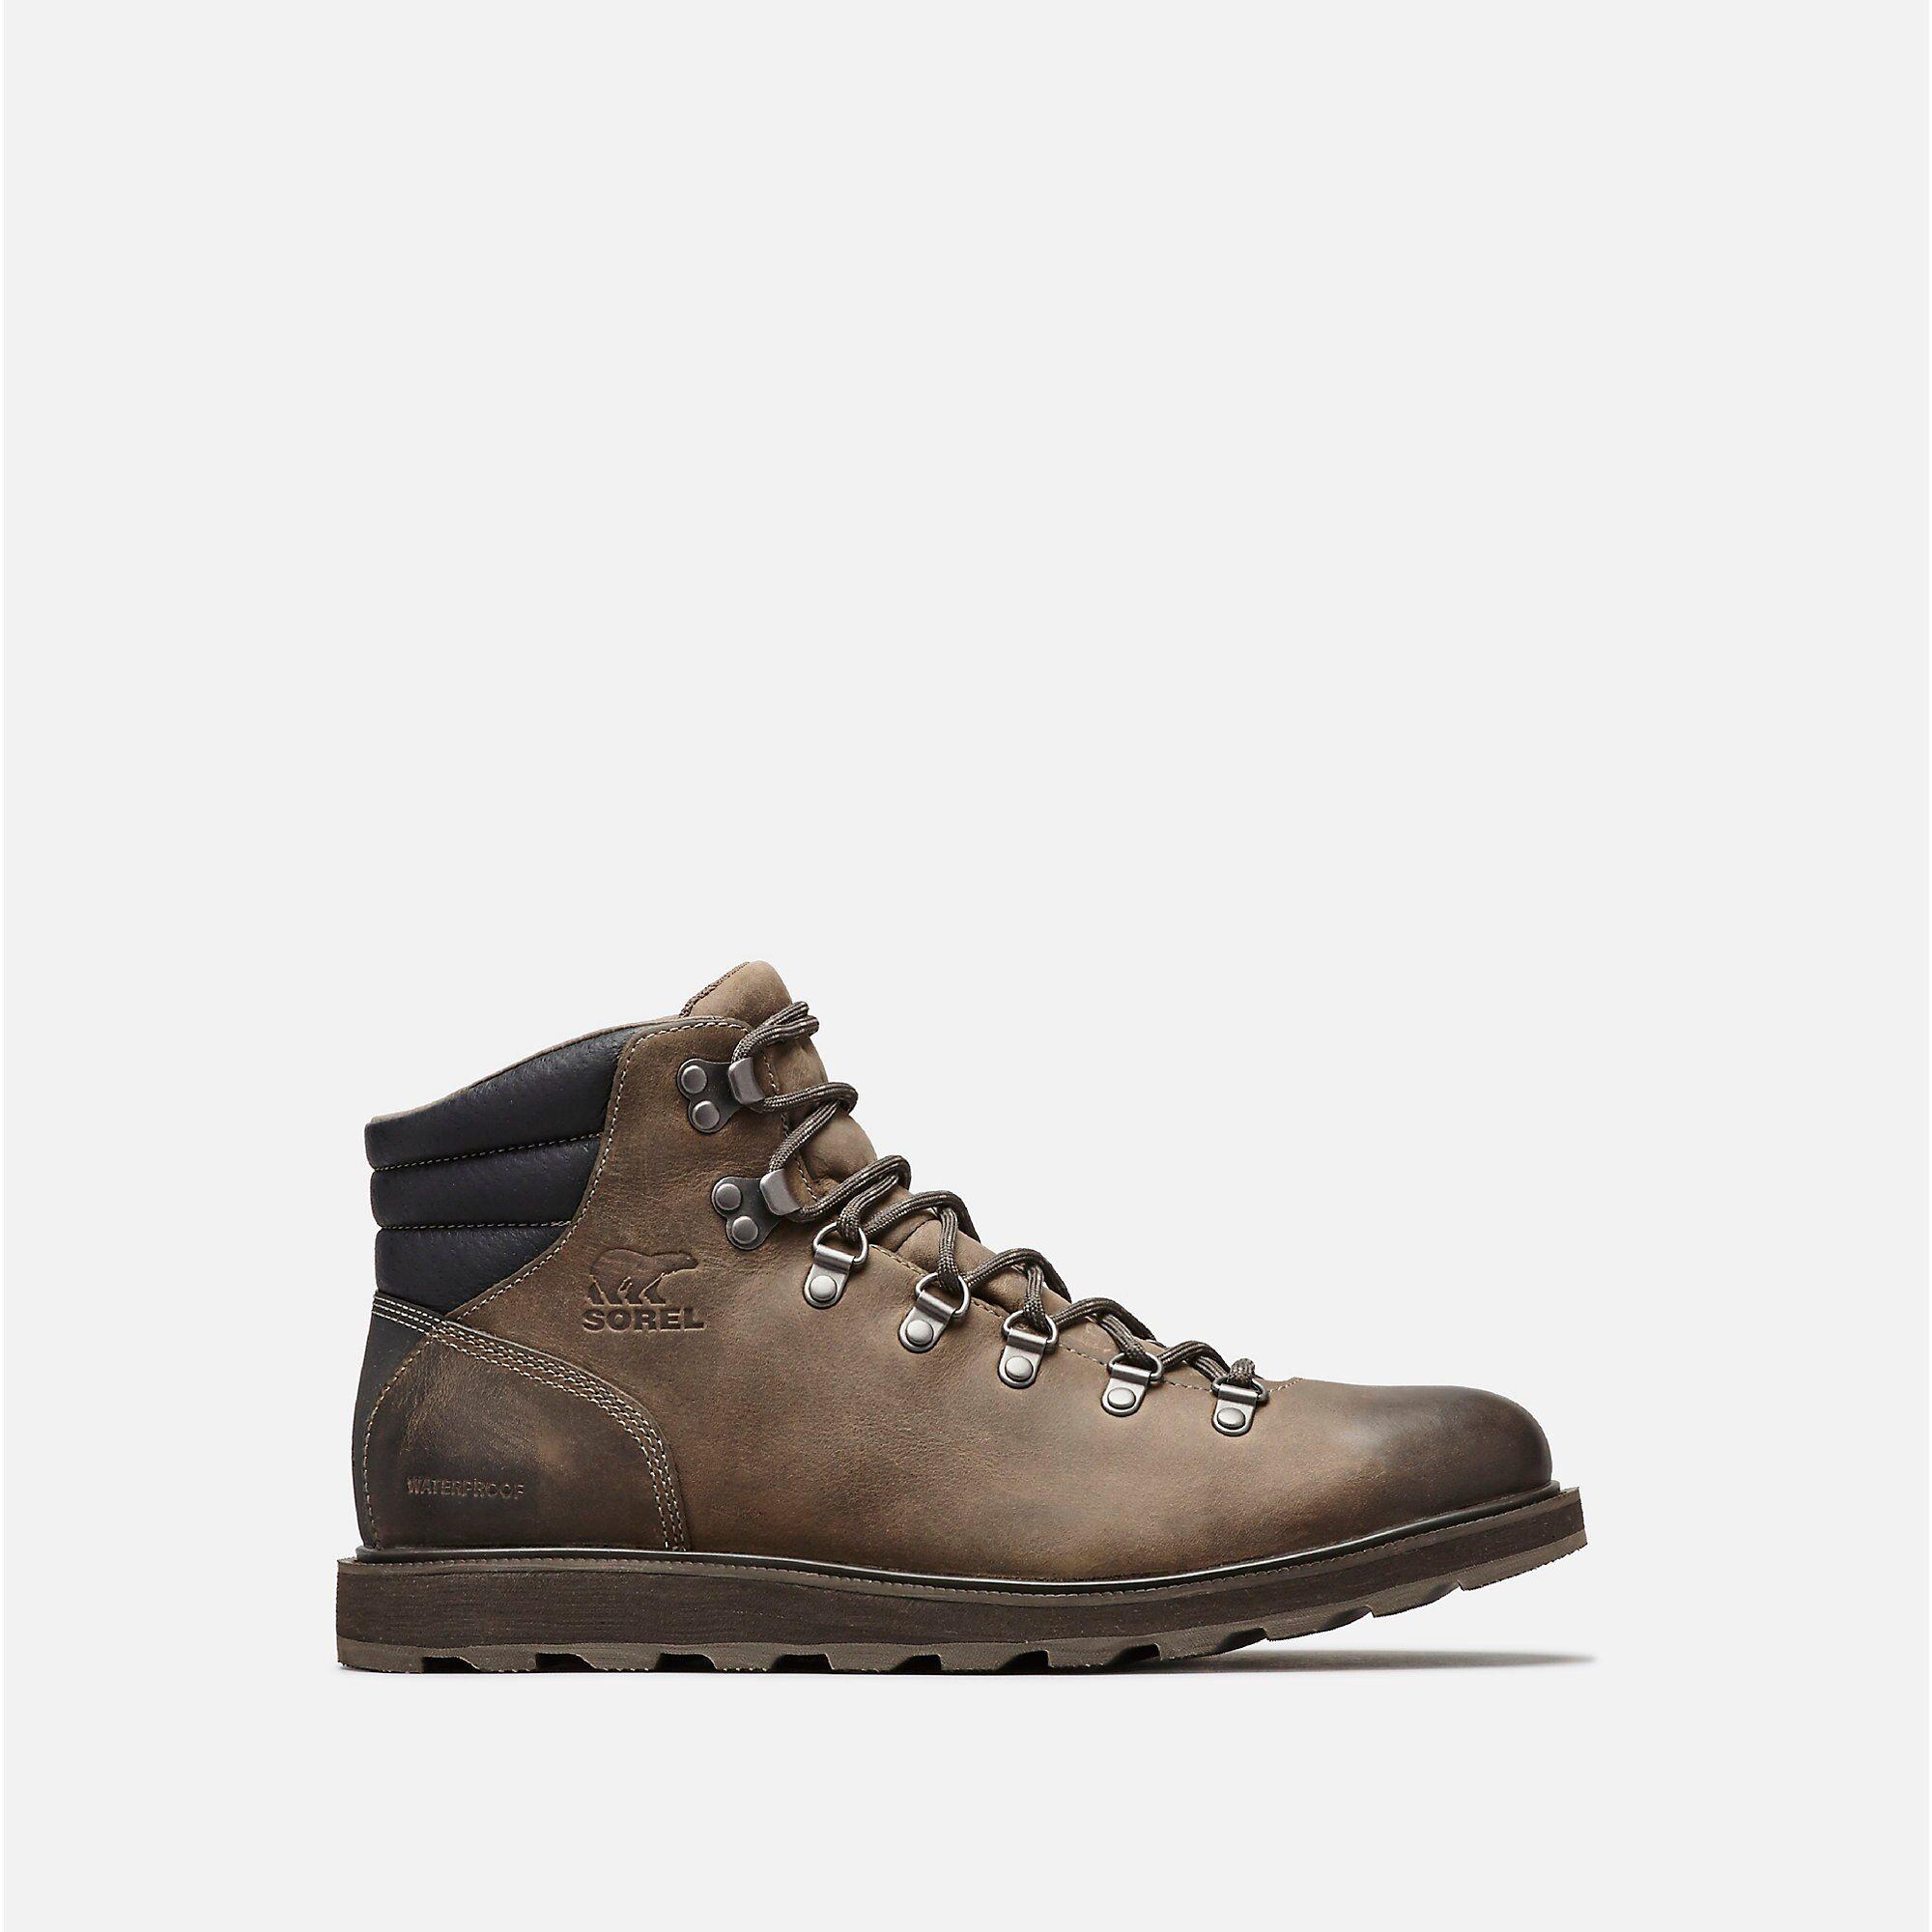 Madson™ hiker waterproof   245   11.5 in 2020   Boots, Sorel